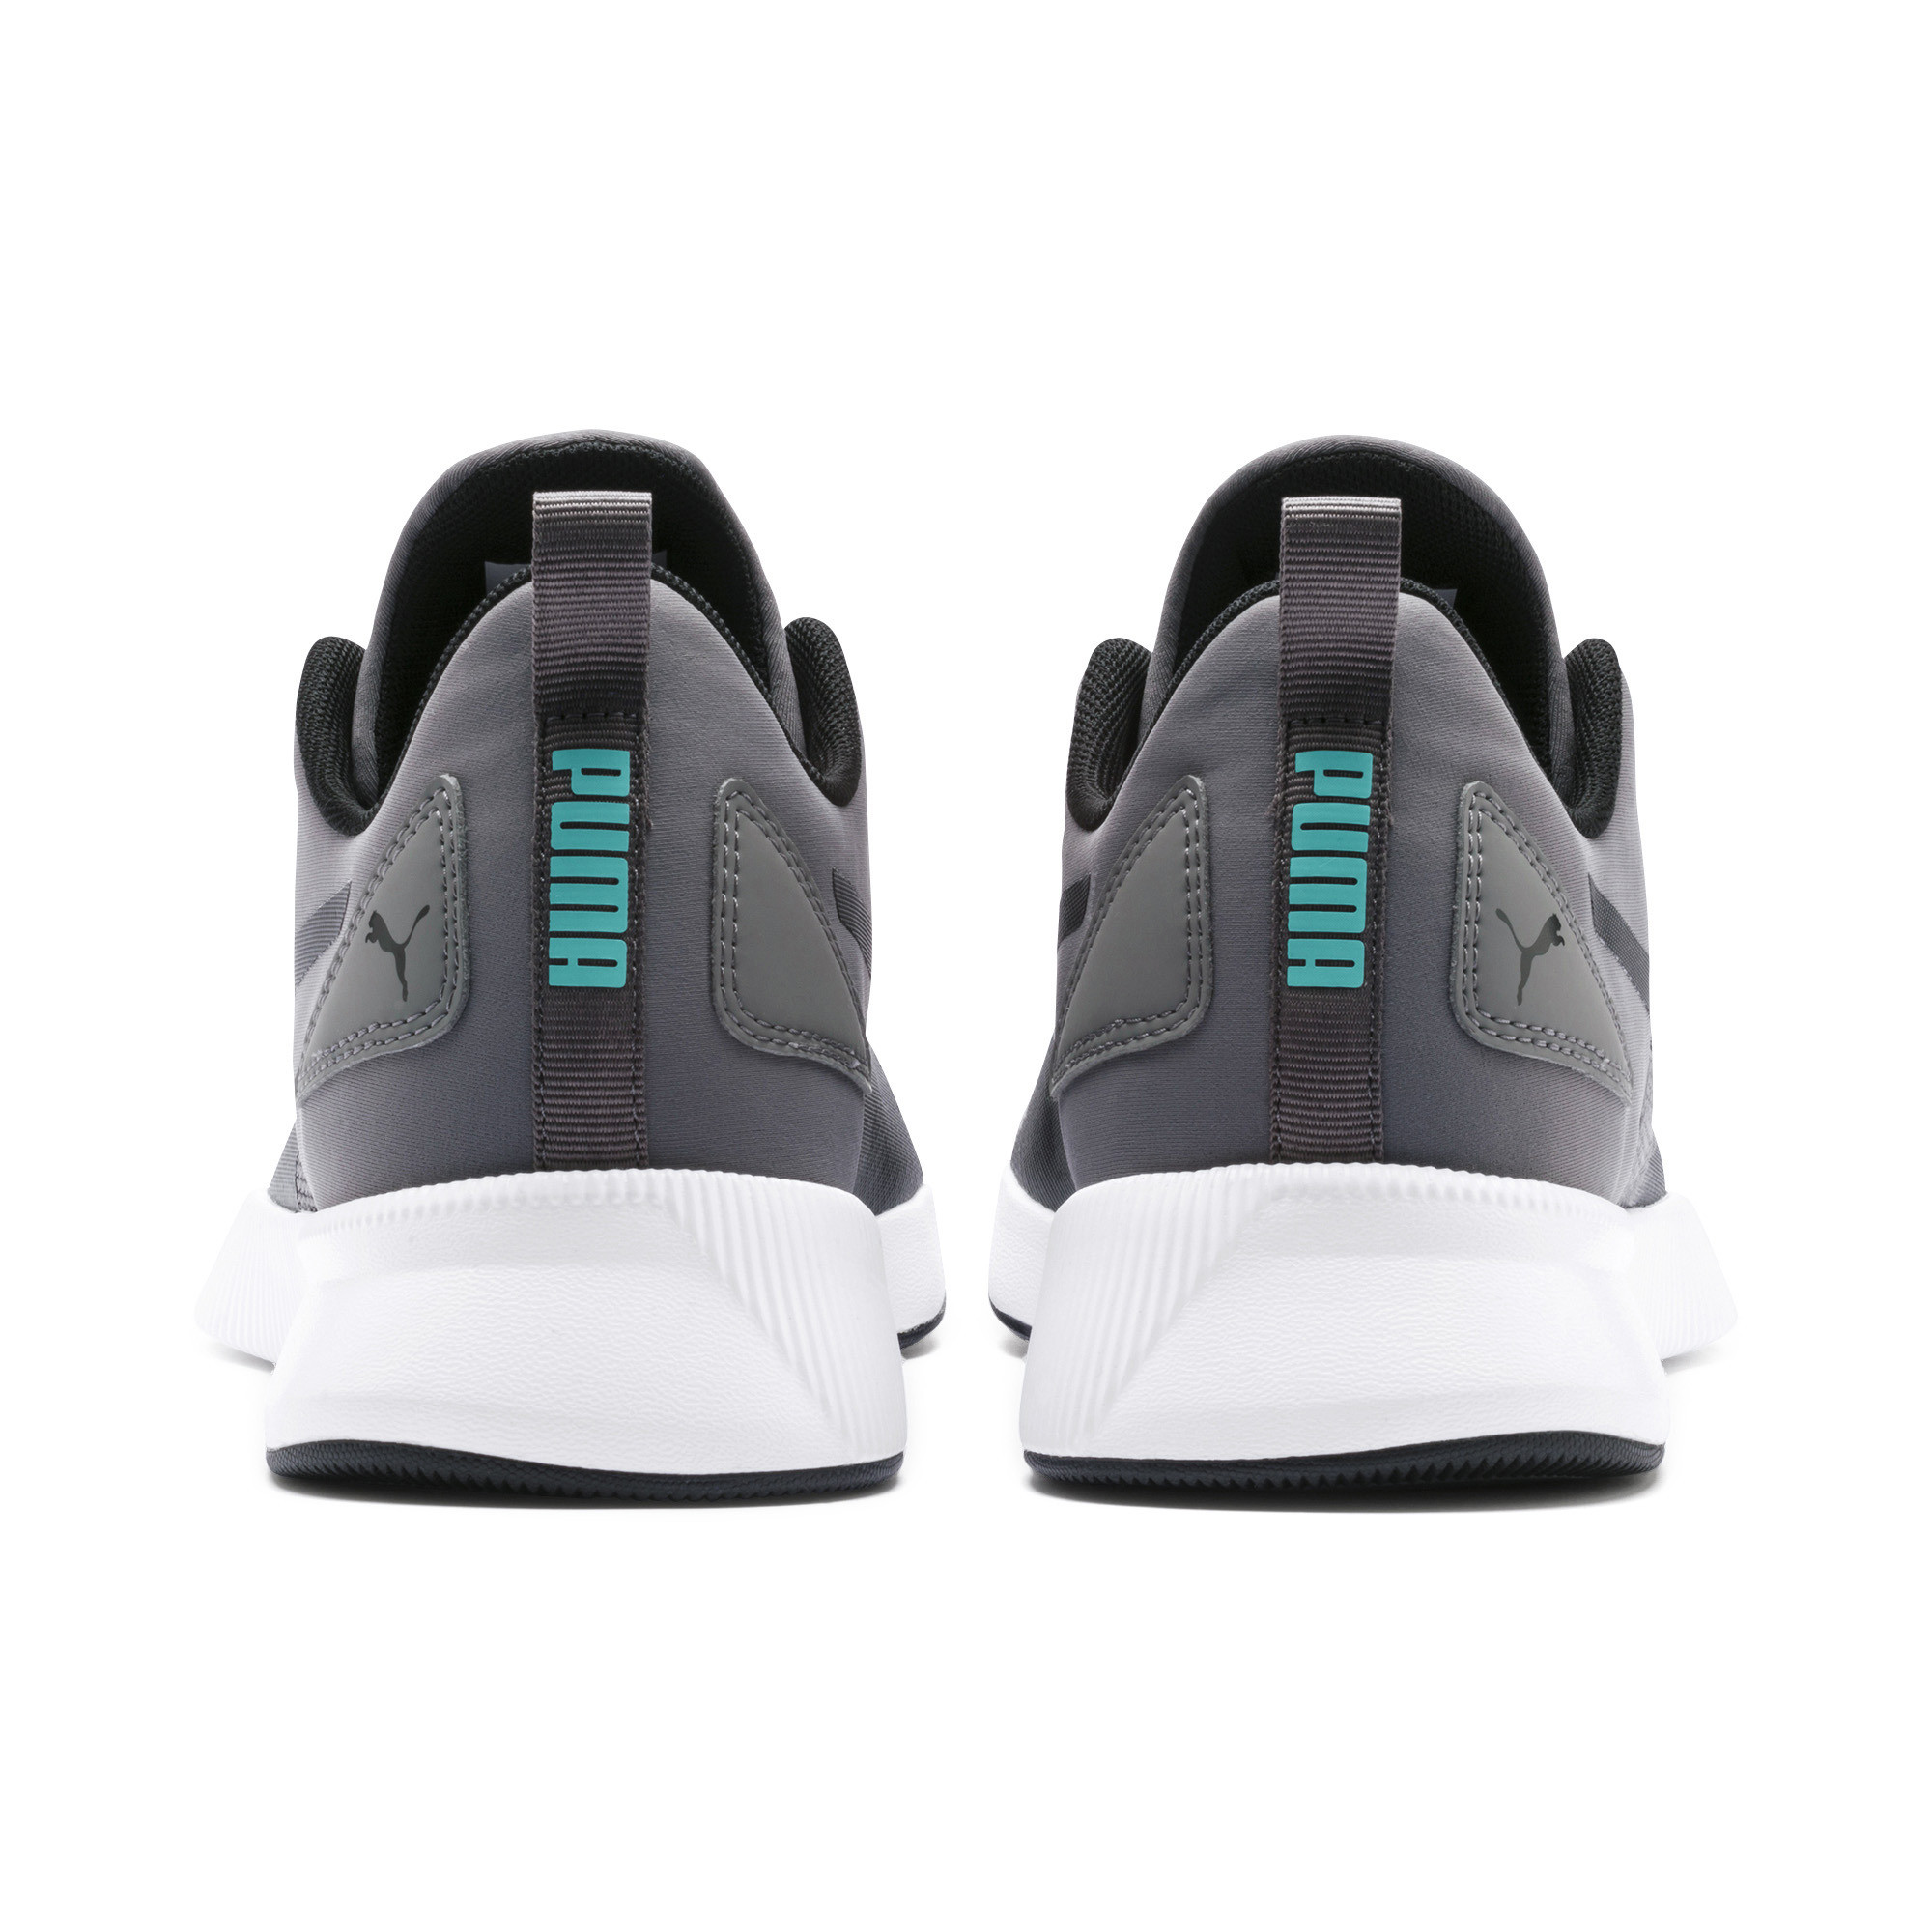 PUMA-Flyer-Runner-Running-Shoes-Mens-Shoe-Running thumbnail 15